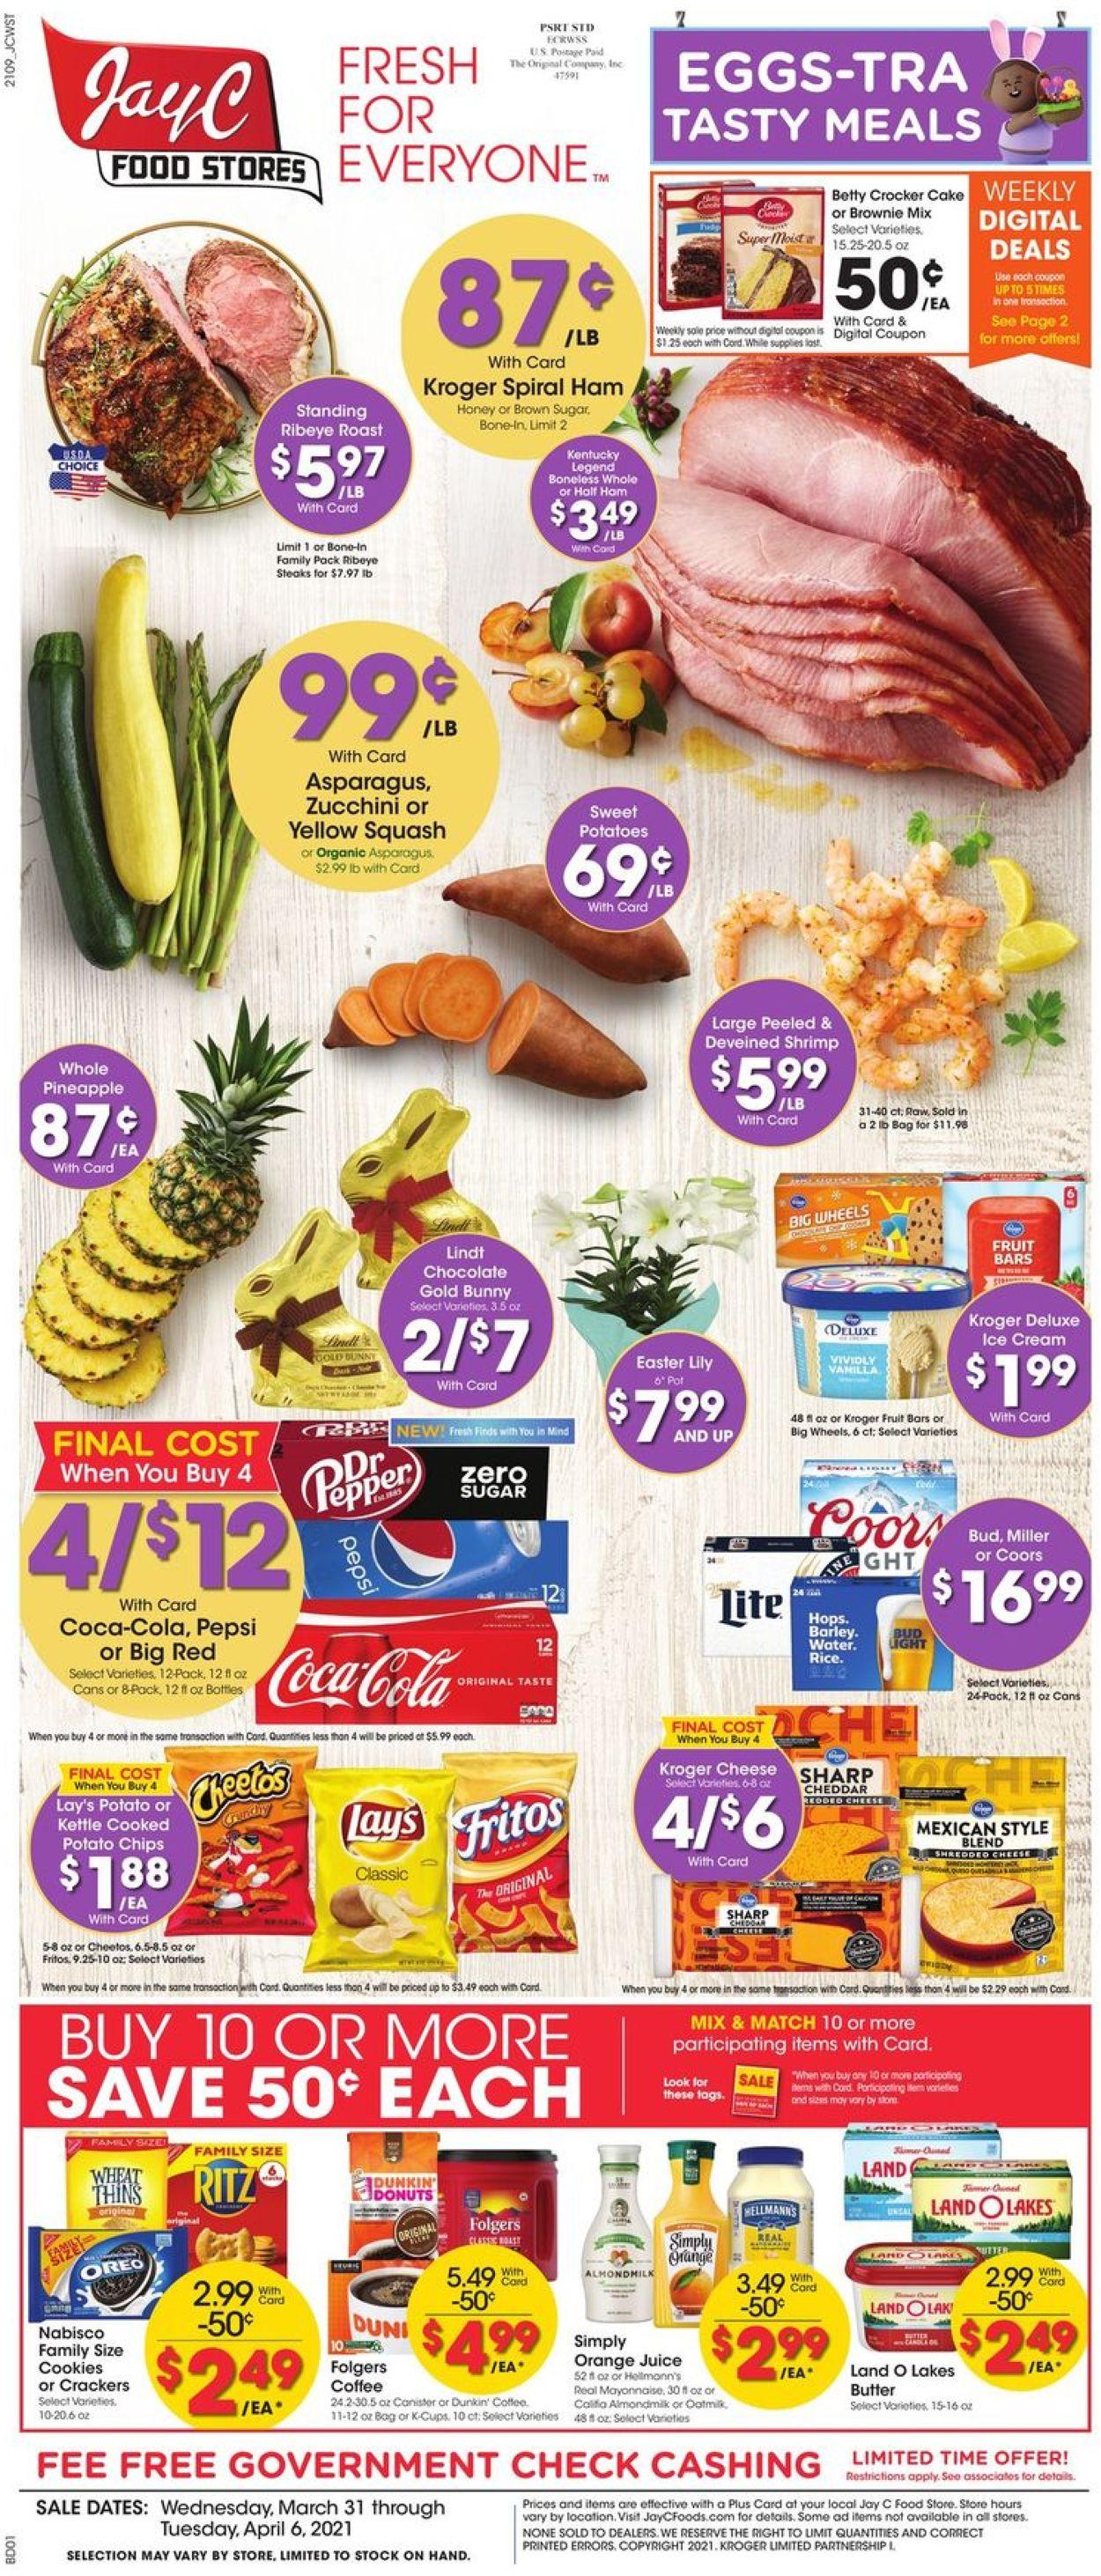 Jay C Food Stores - Easter 2021 Weekly Ad Circular - valid 03/31-04/06/2021